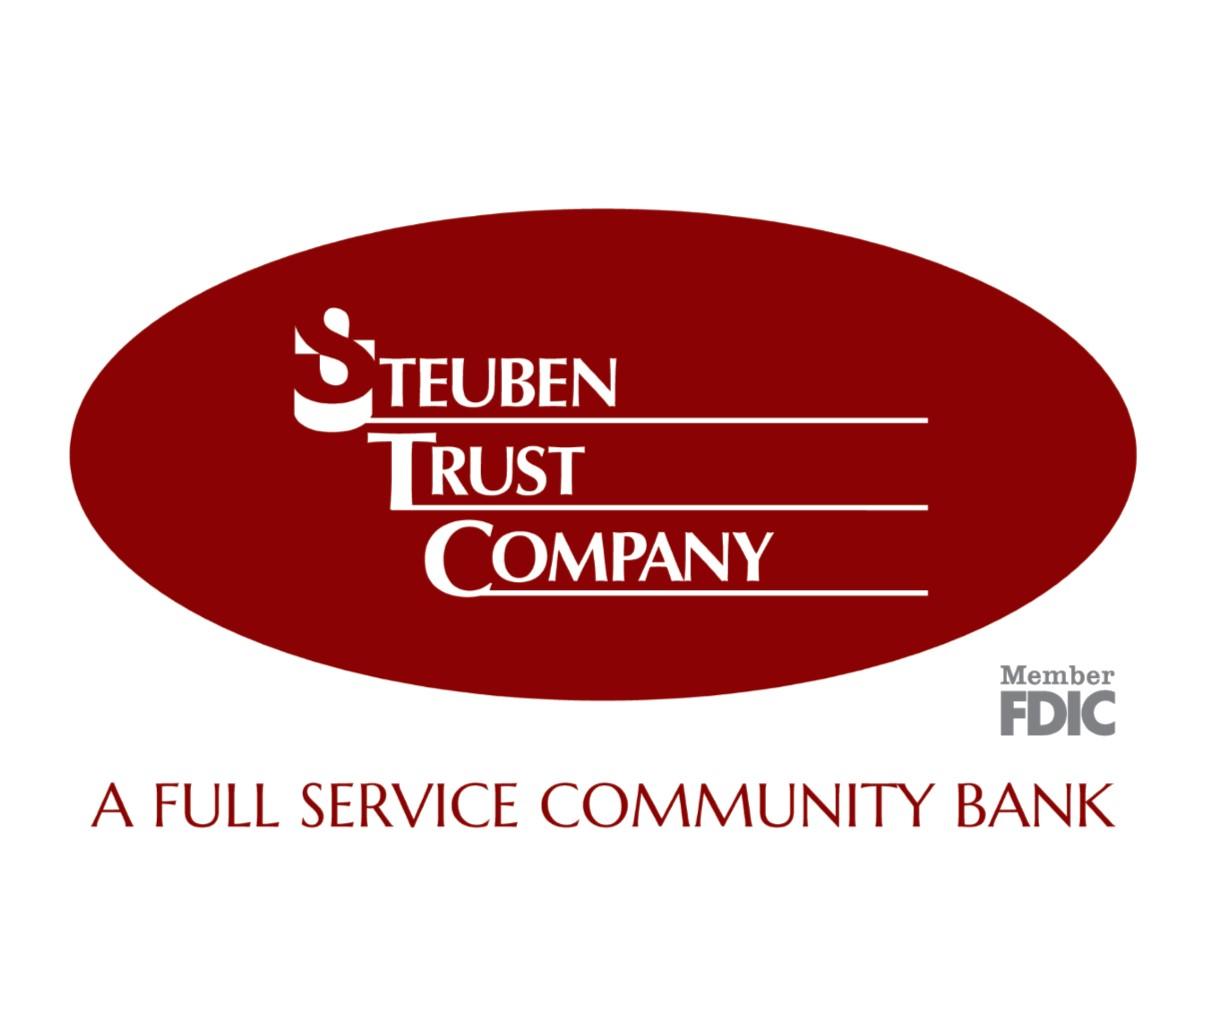 SteubenTrust-Logo-ConventionSponsor-Reel-3